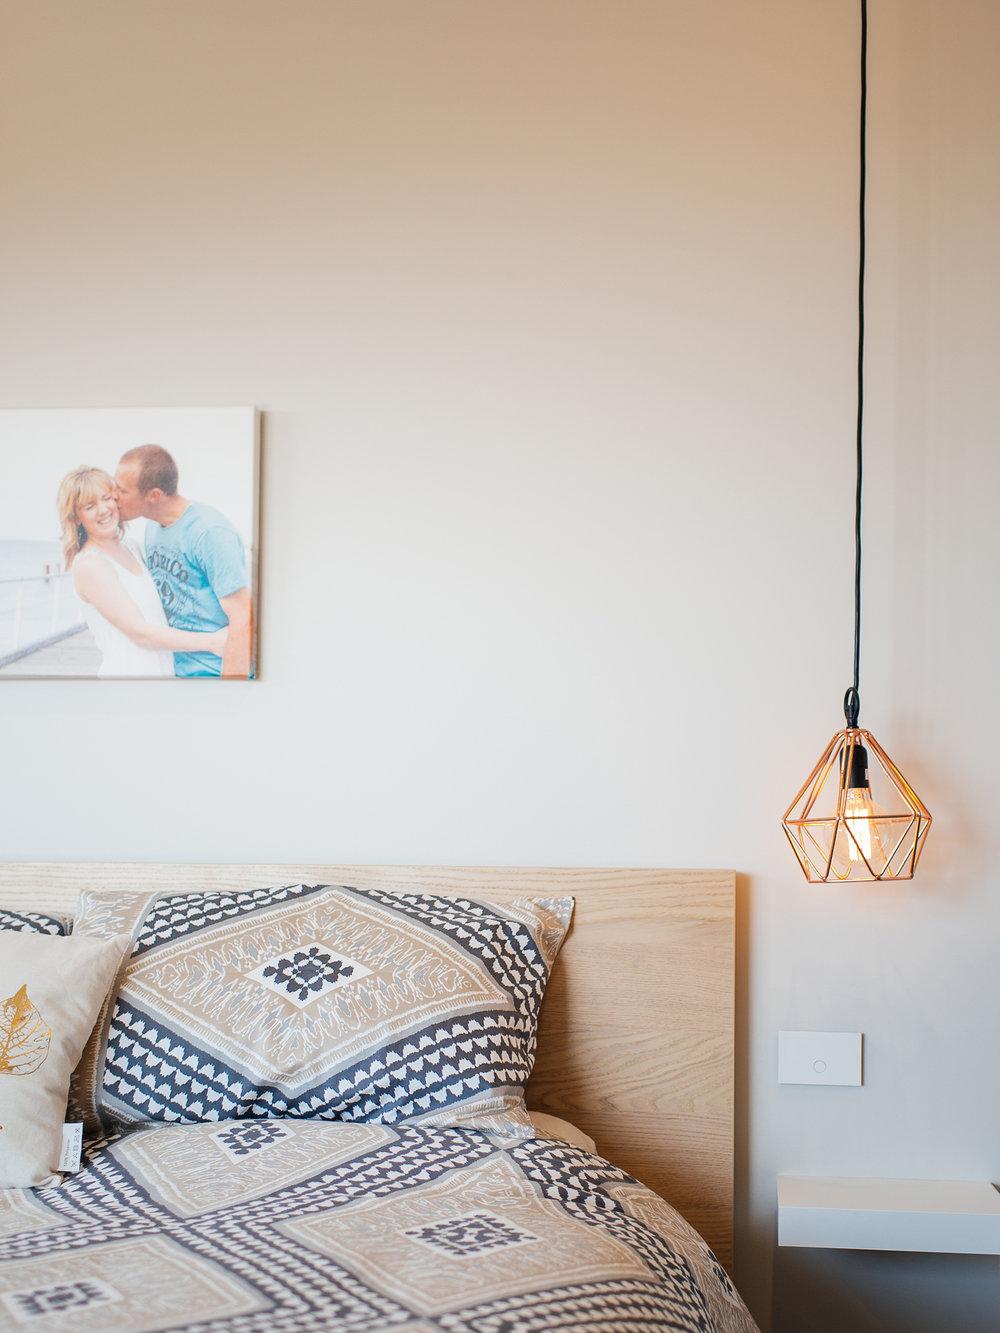 Residential Electrical - Pendant Light